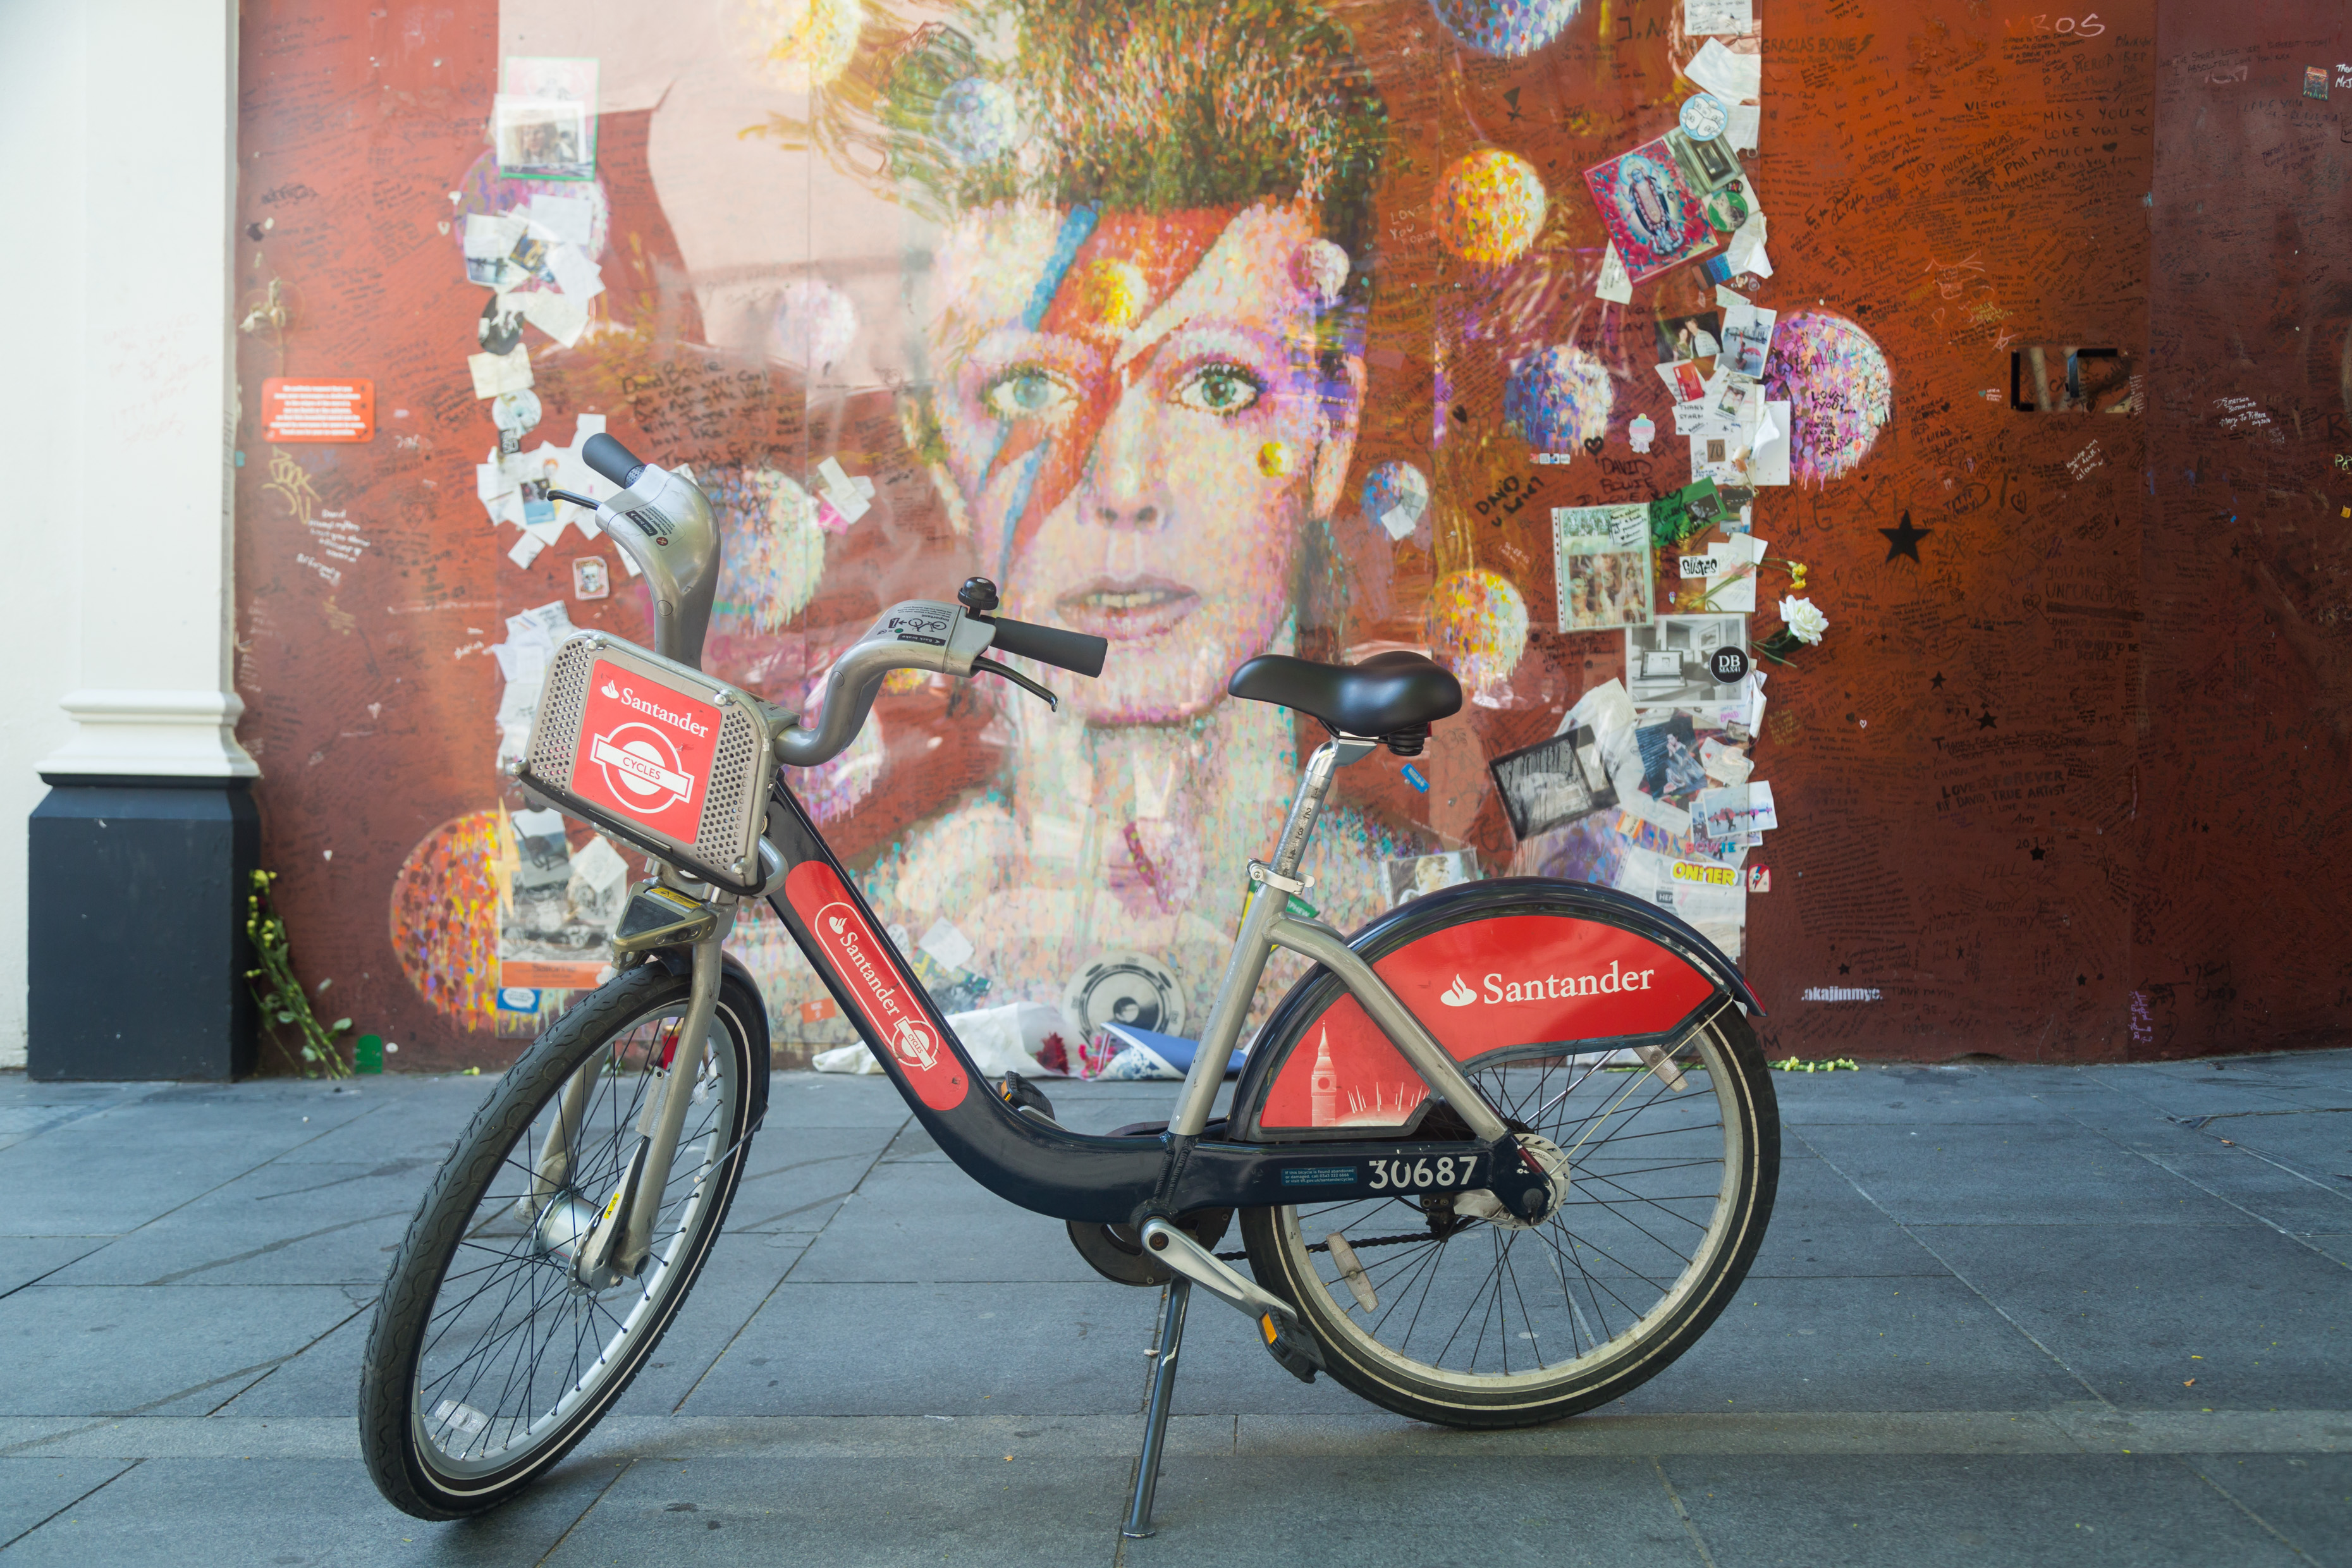 Santander public hire bikes unveiled in Brixton | Cyclist